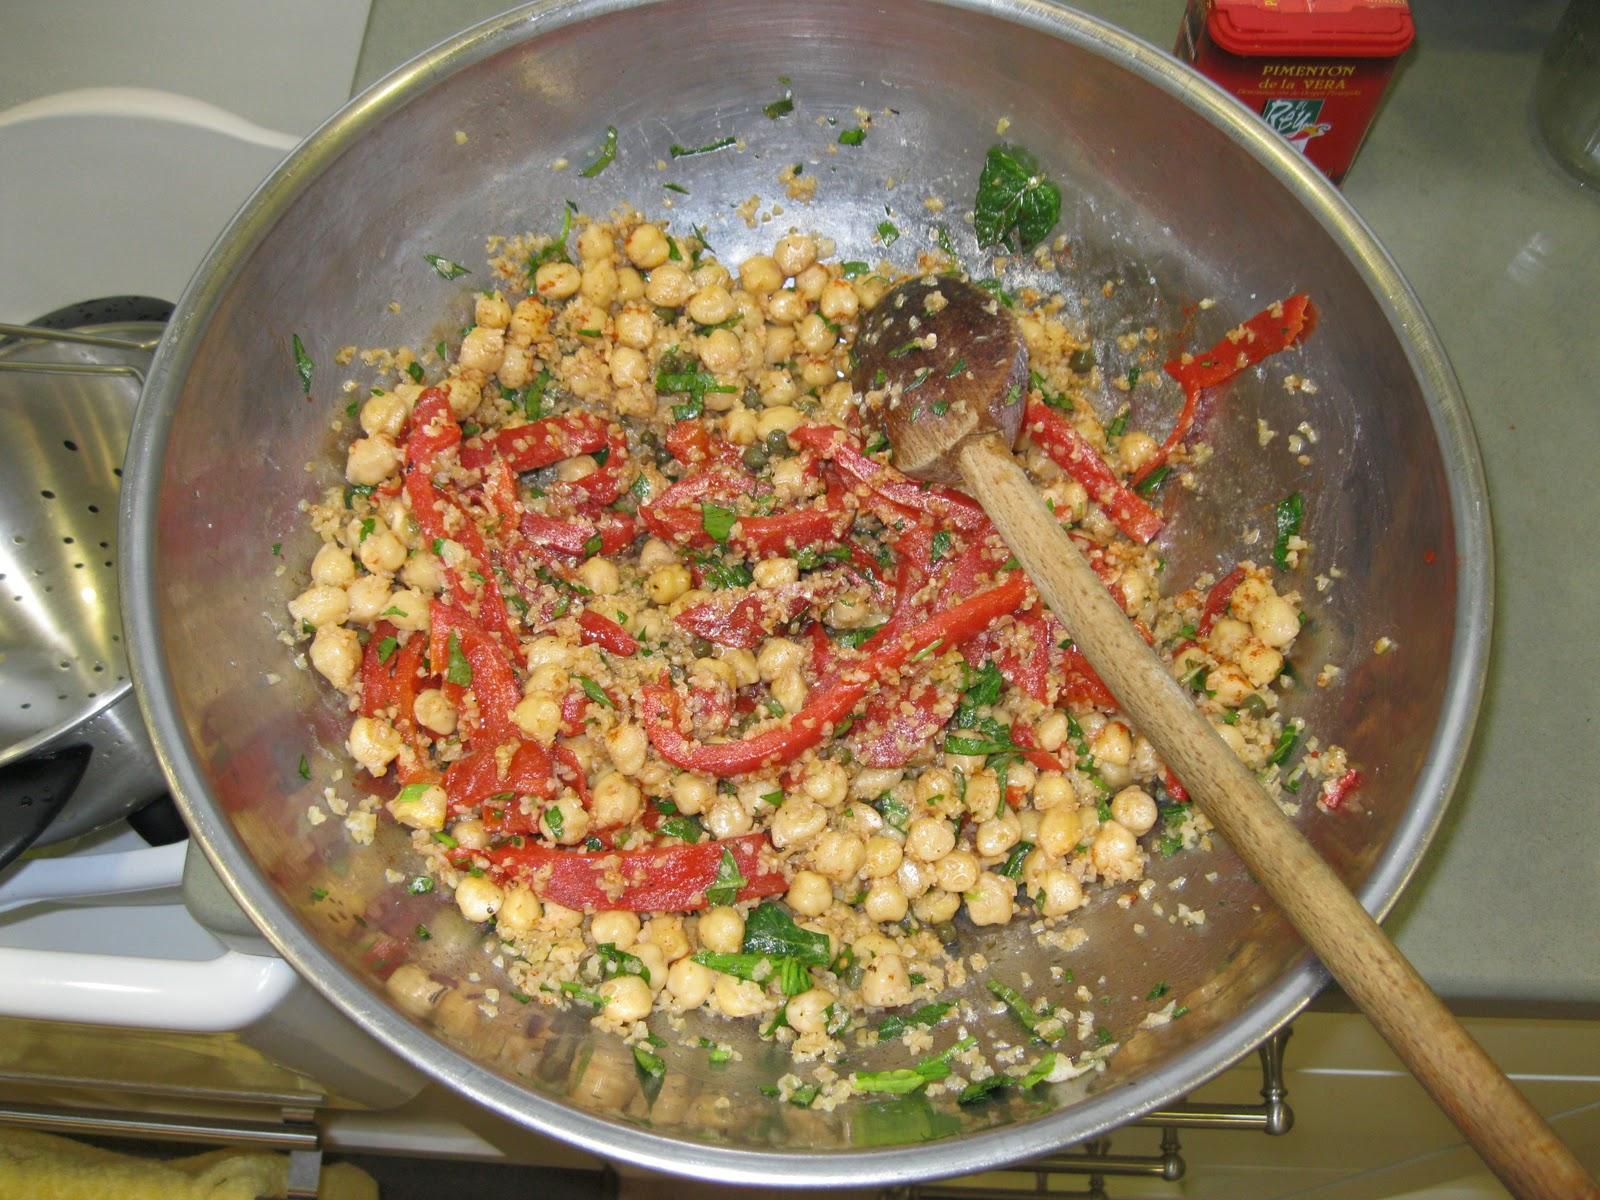 Kevin Mac Cooking: Roasted Bronzino